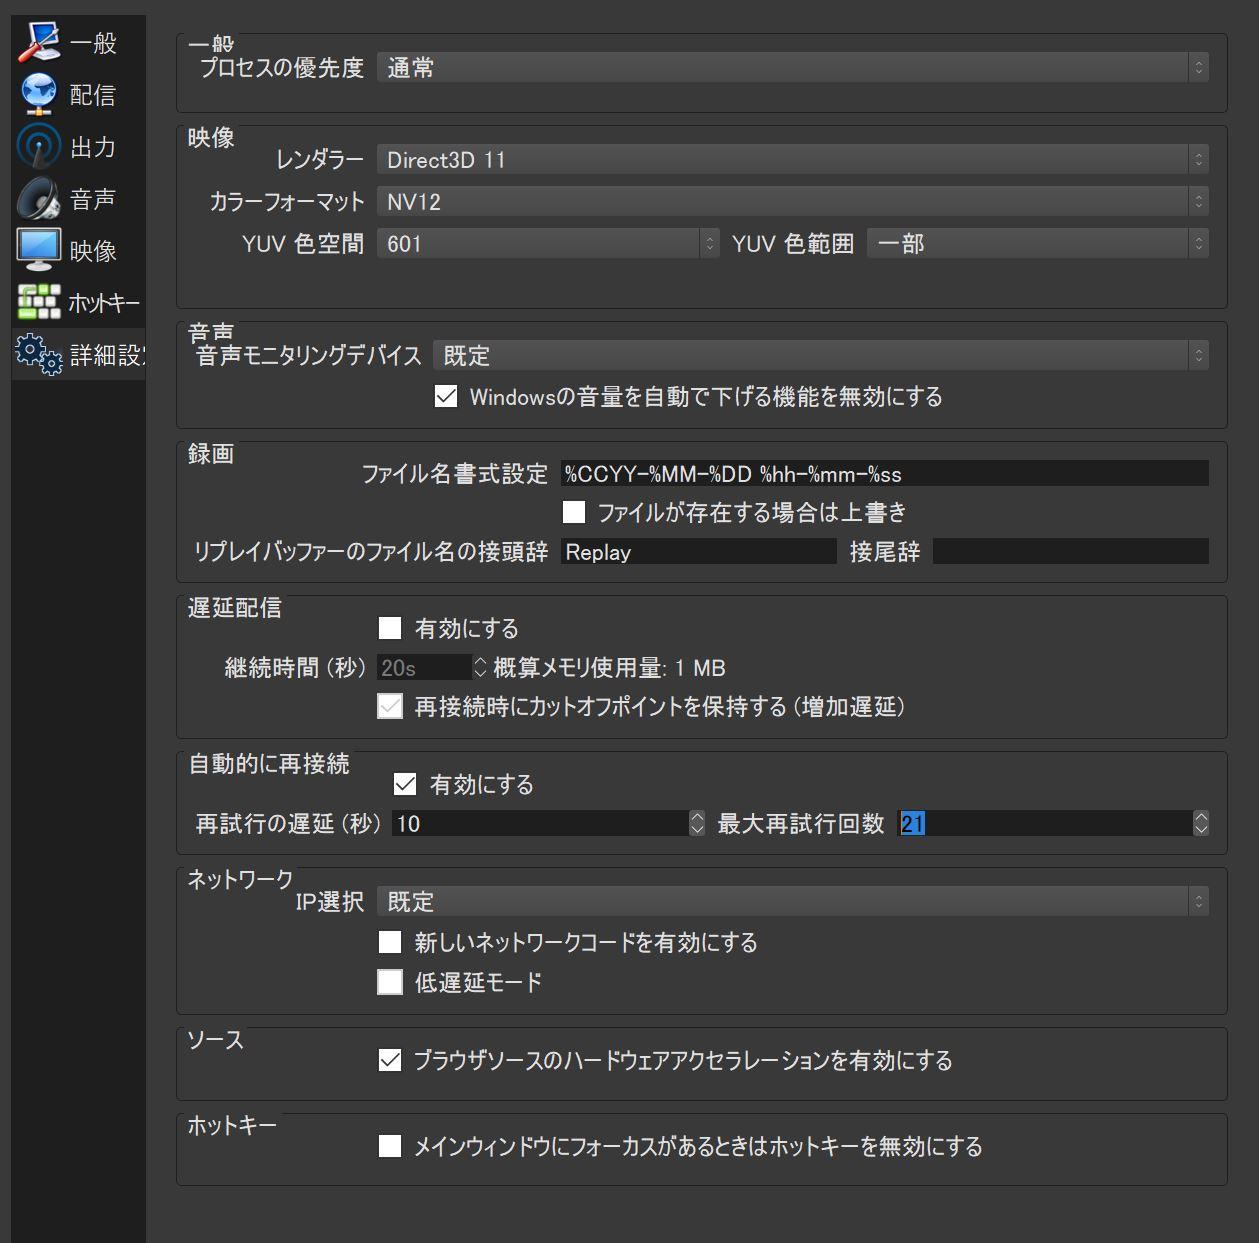 obs_studio_setting.JPG